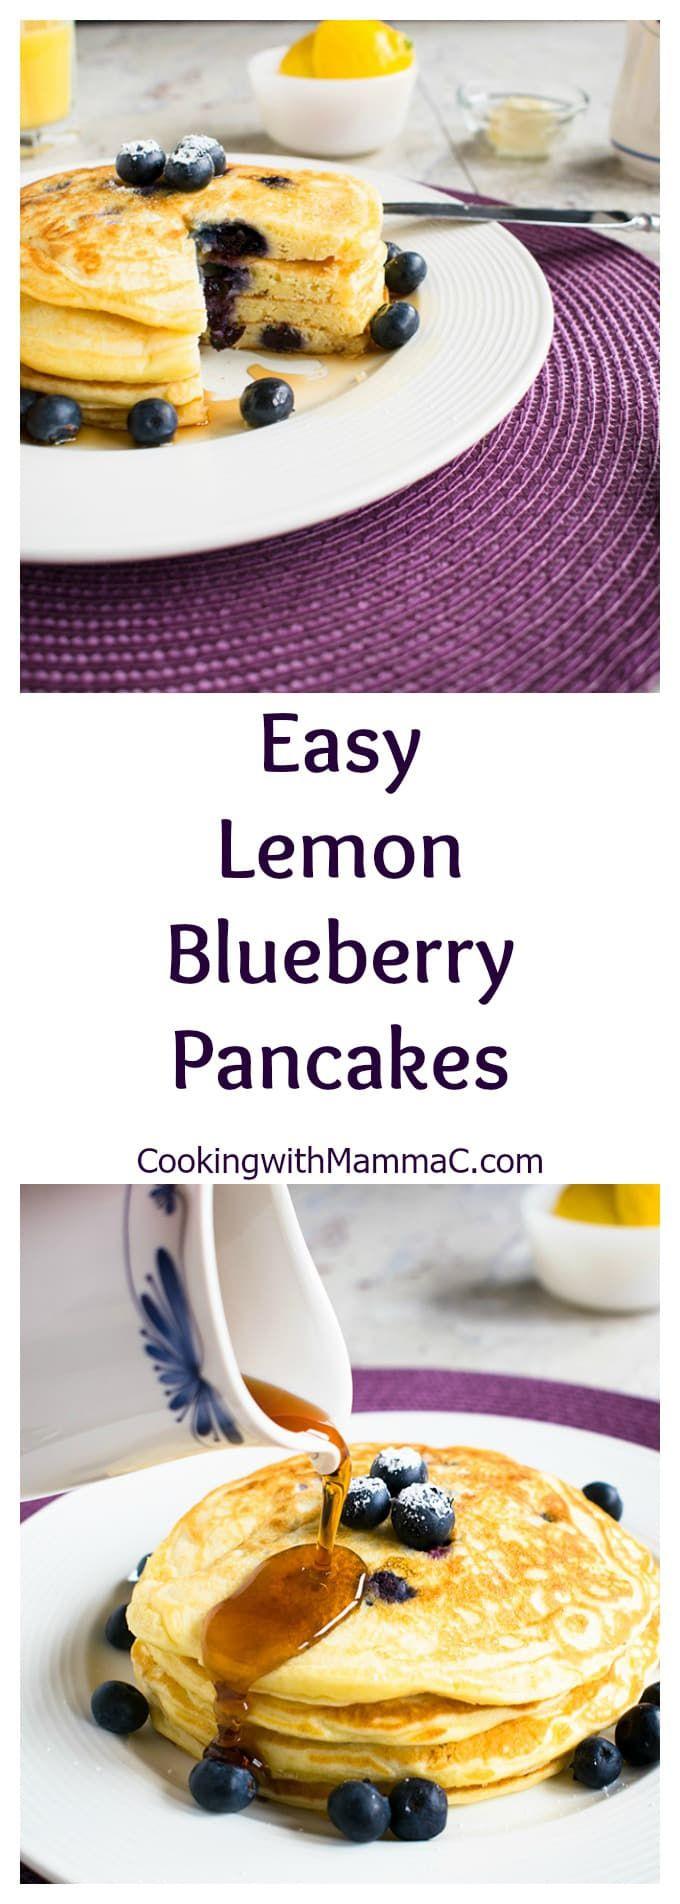 Easy Lemon-Blueberry Pancakes - A delicious breakfast or even dinner!